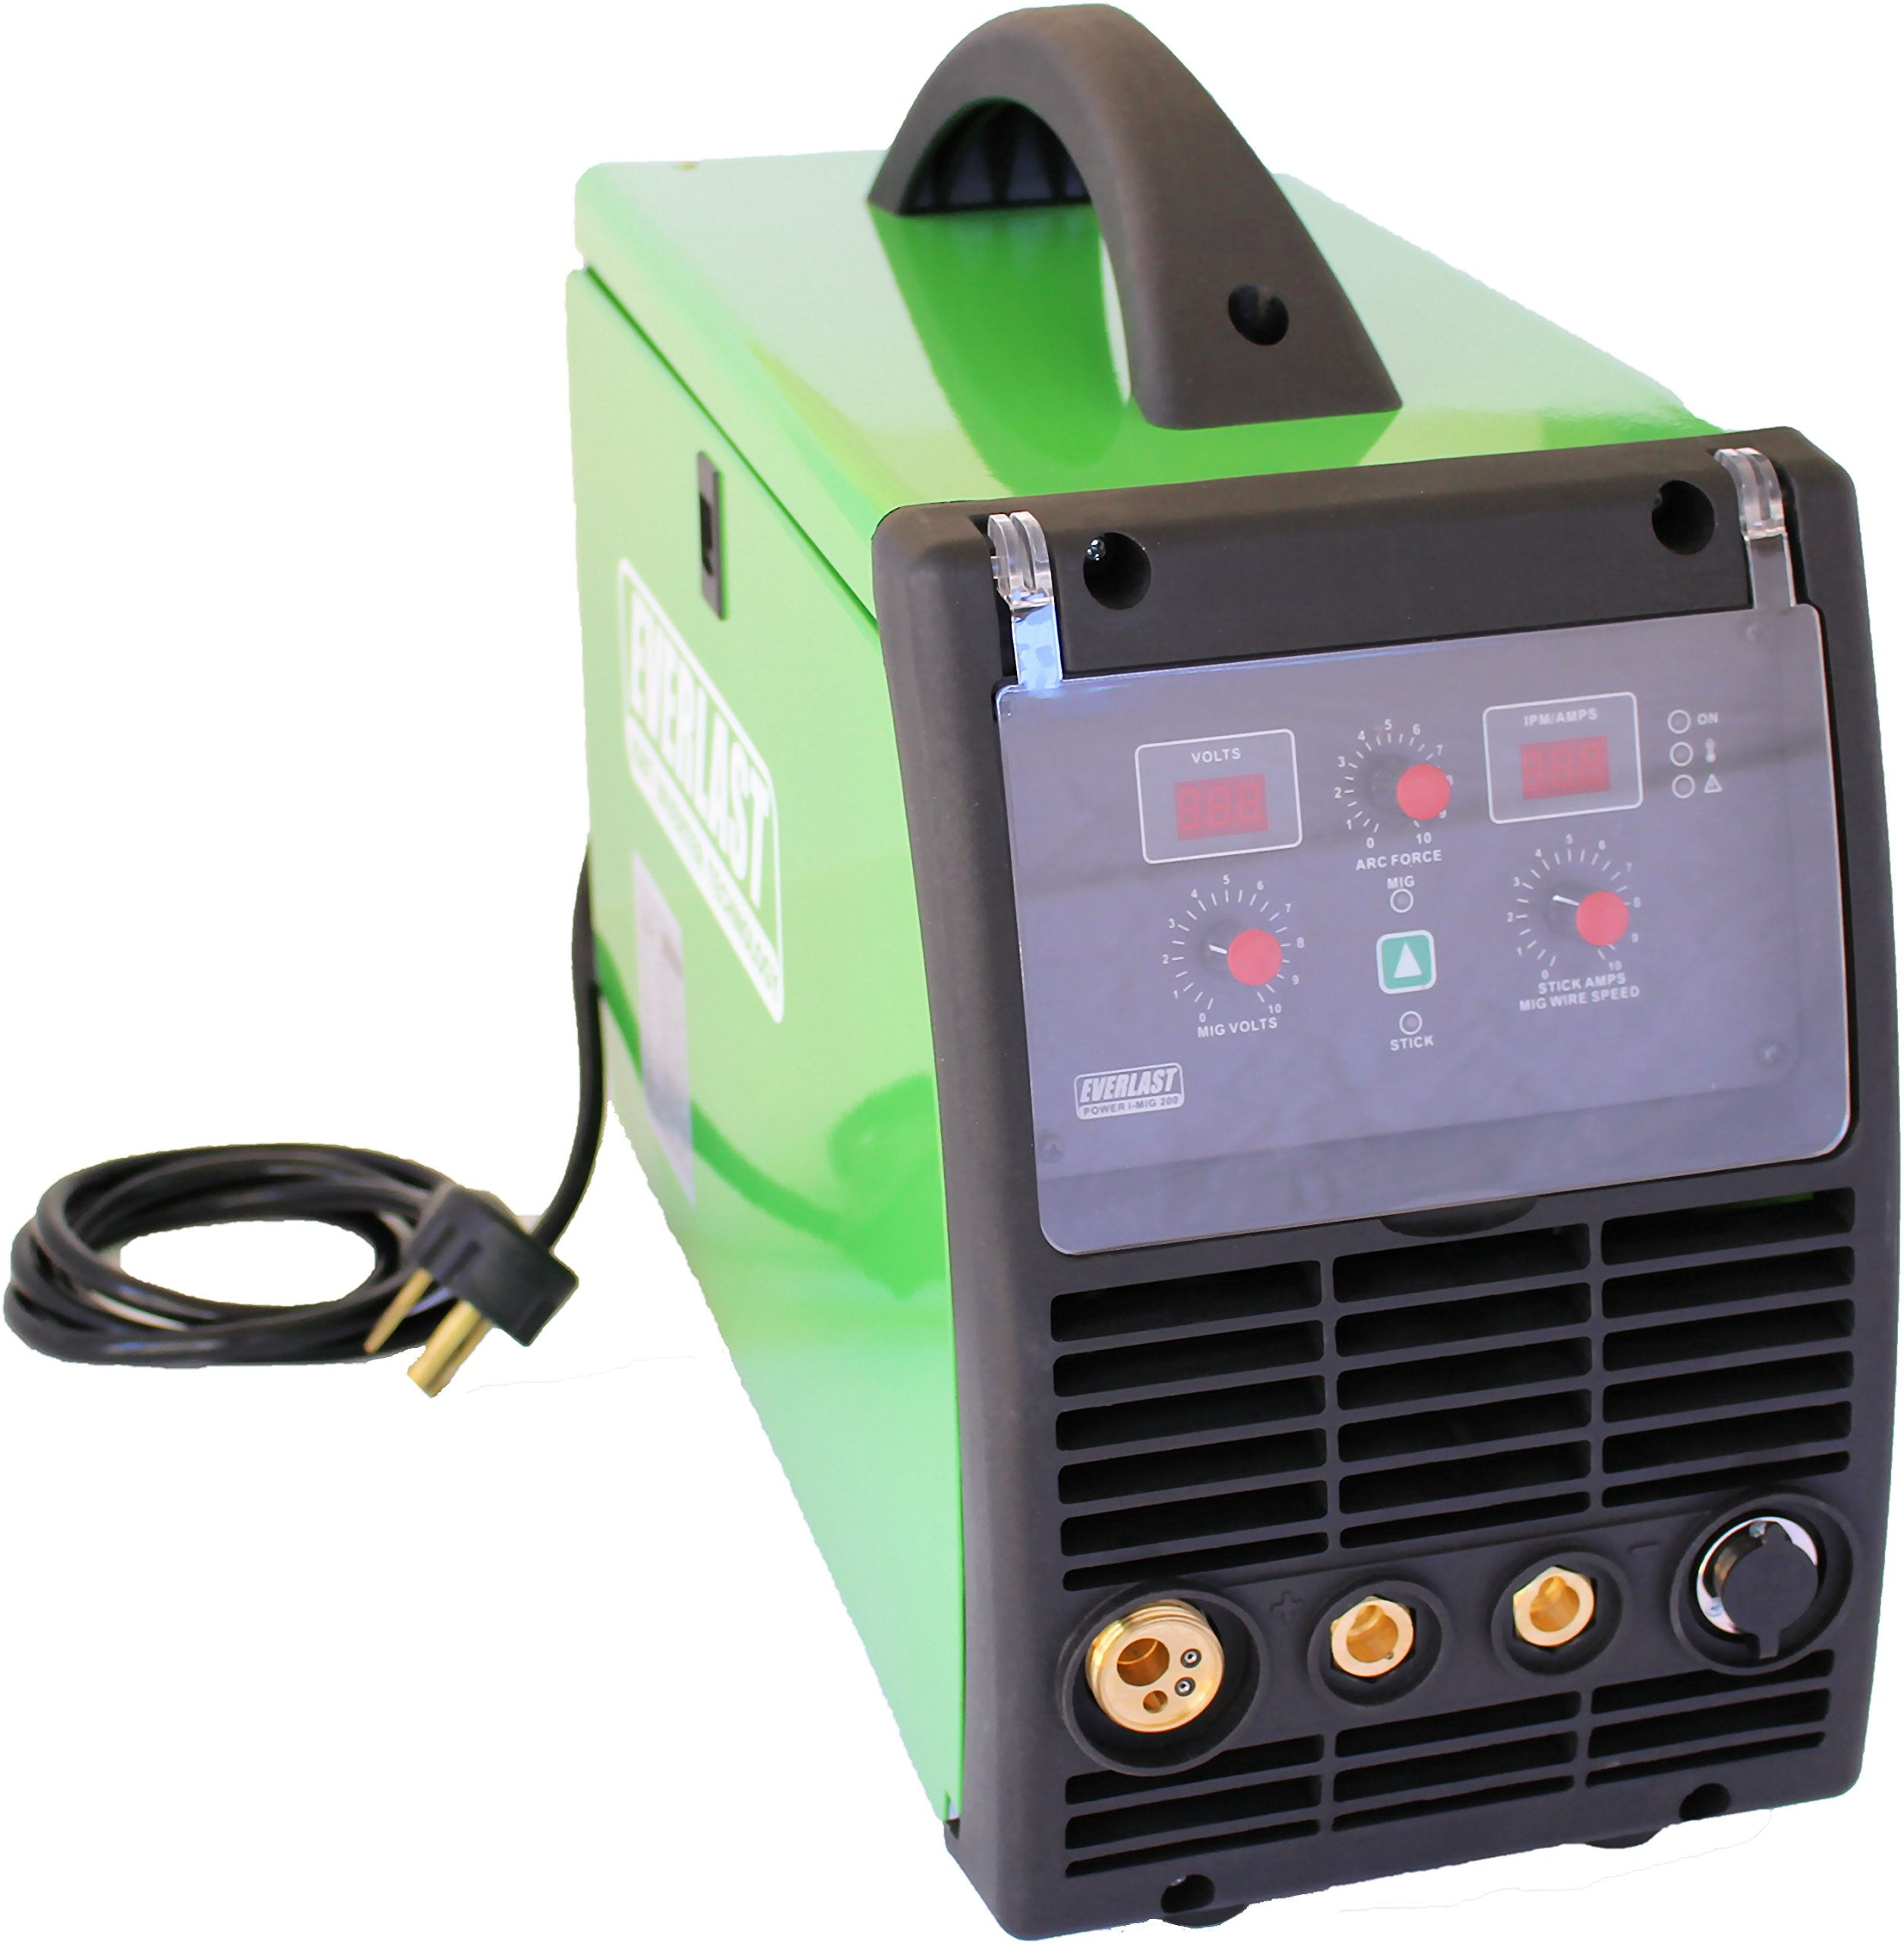 2019 Everlast PowerMIG 200 200amp MIG stick welder dual voltage 110v/220v spool gun ready by Everlast Power Equipment